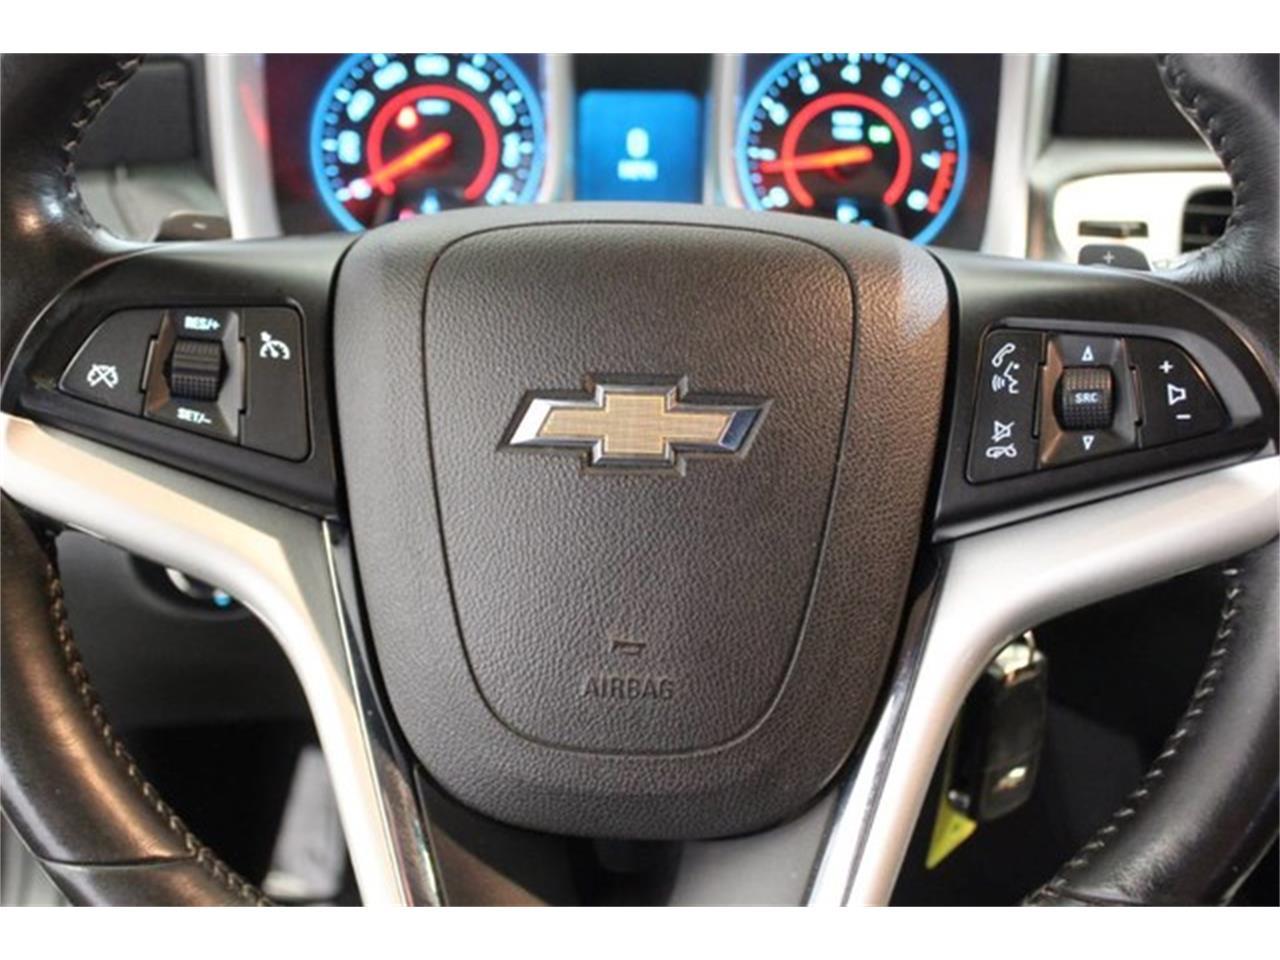 2013 Chevrolet Camaro (CC-1340400) for sale in Anaheim, California